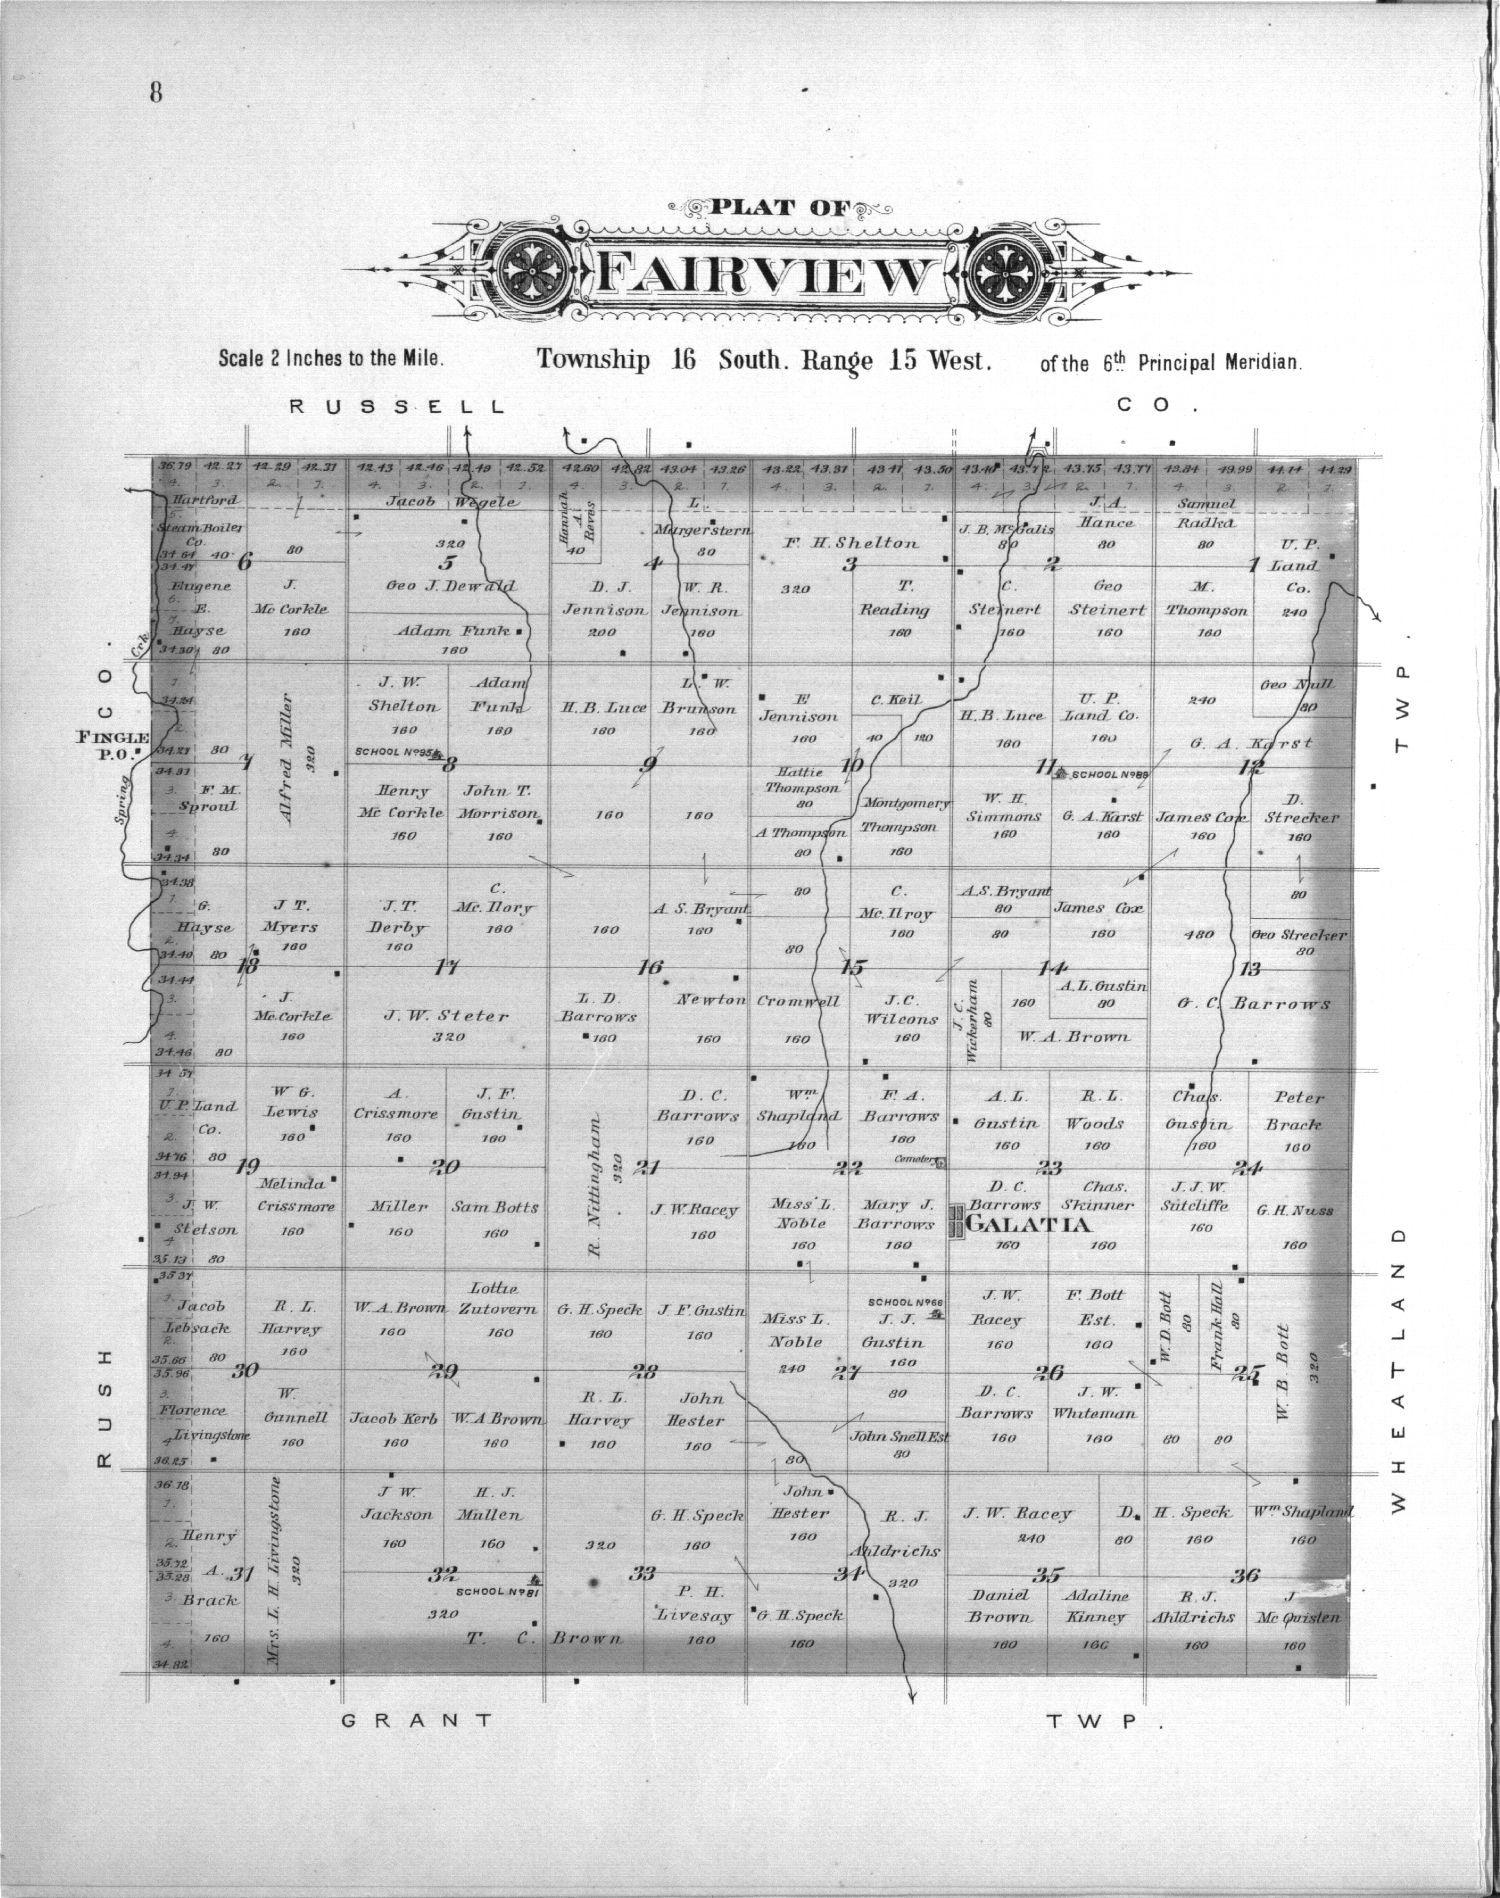 Plat book, Barton County, Kansas - 8